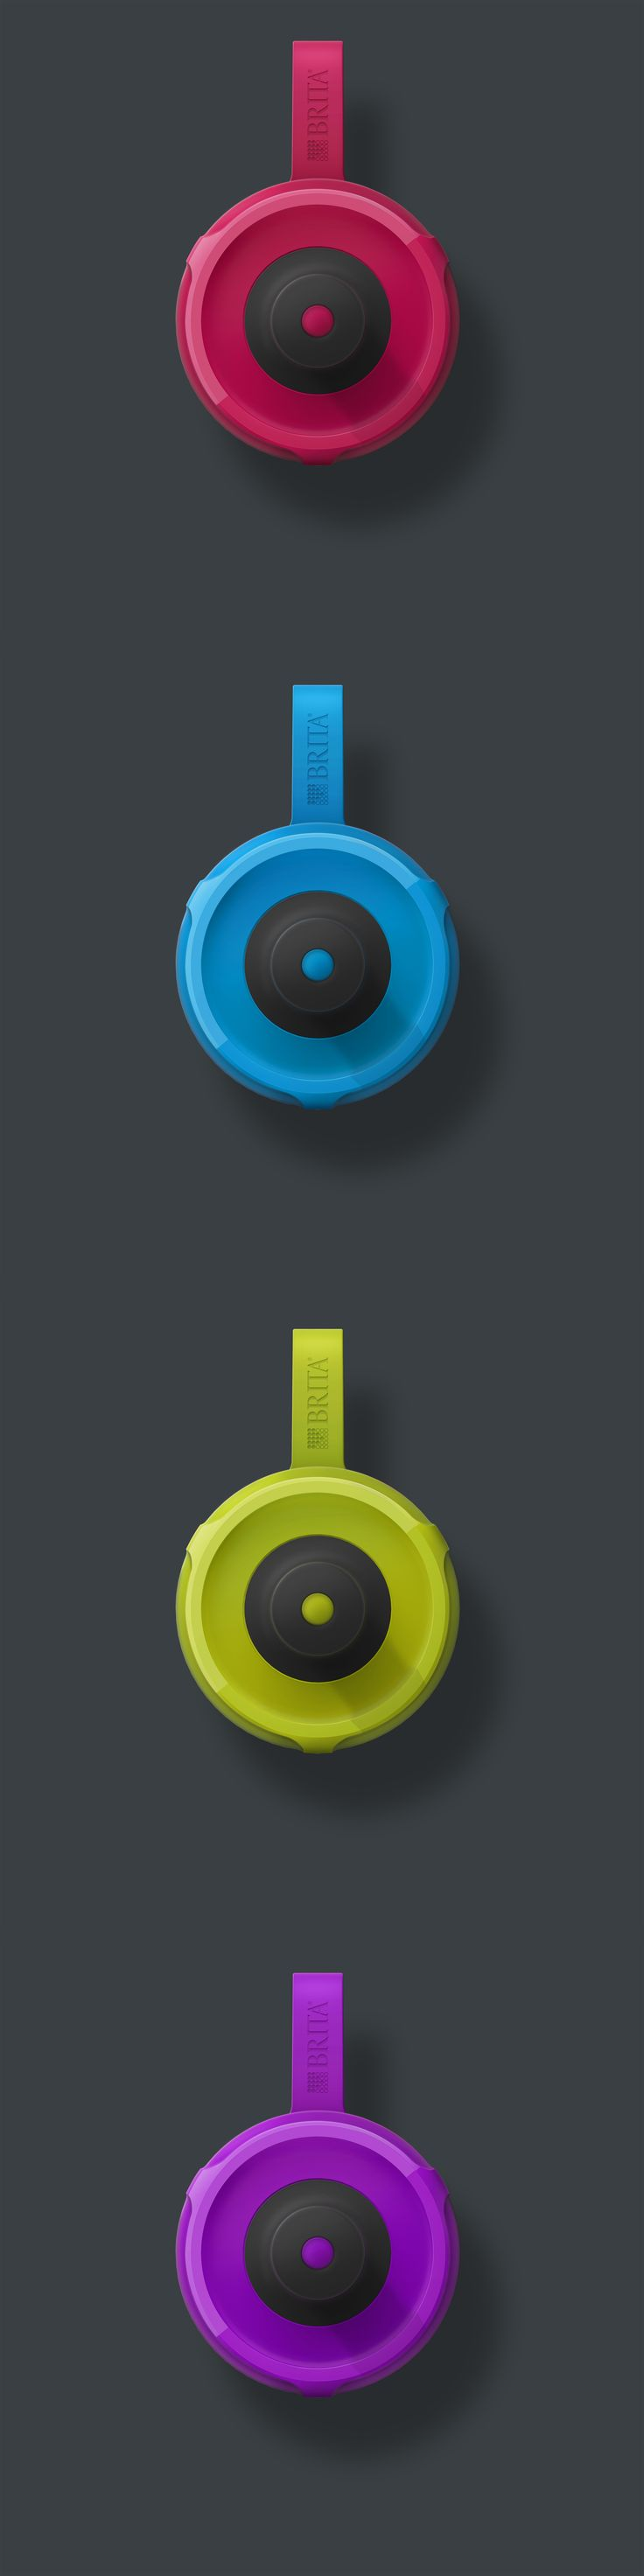 PEARL CREATIVE / industrial design for BRITA fill_go-active-01